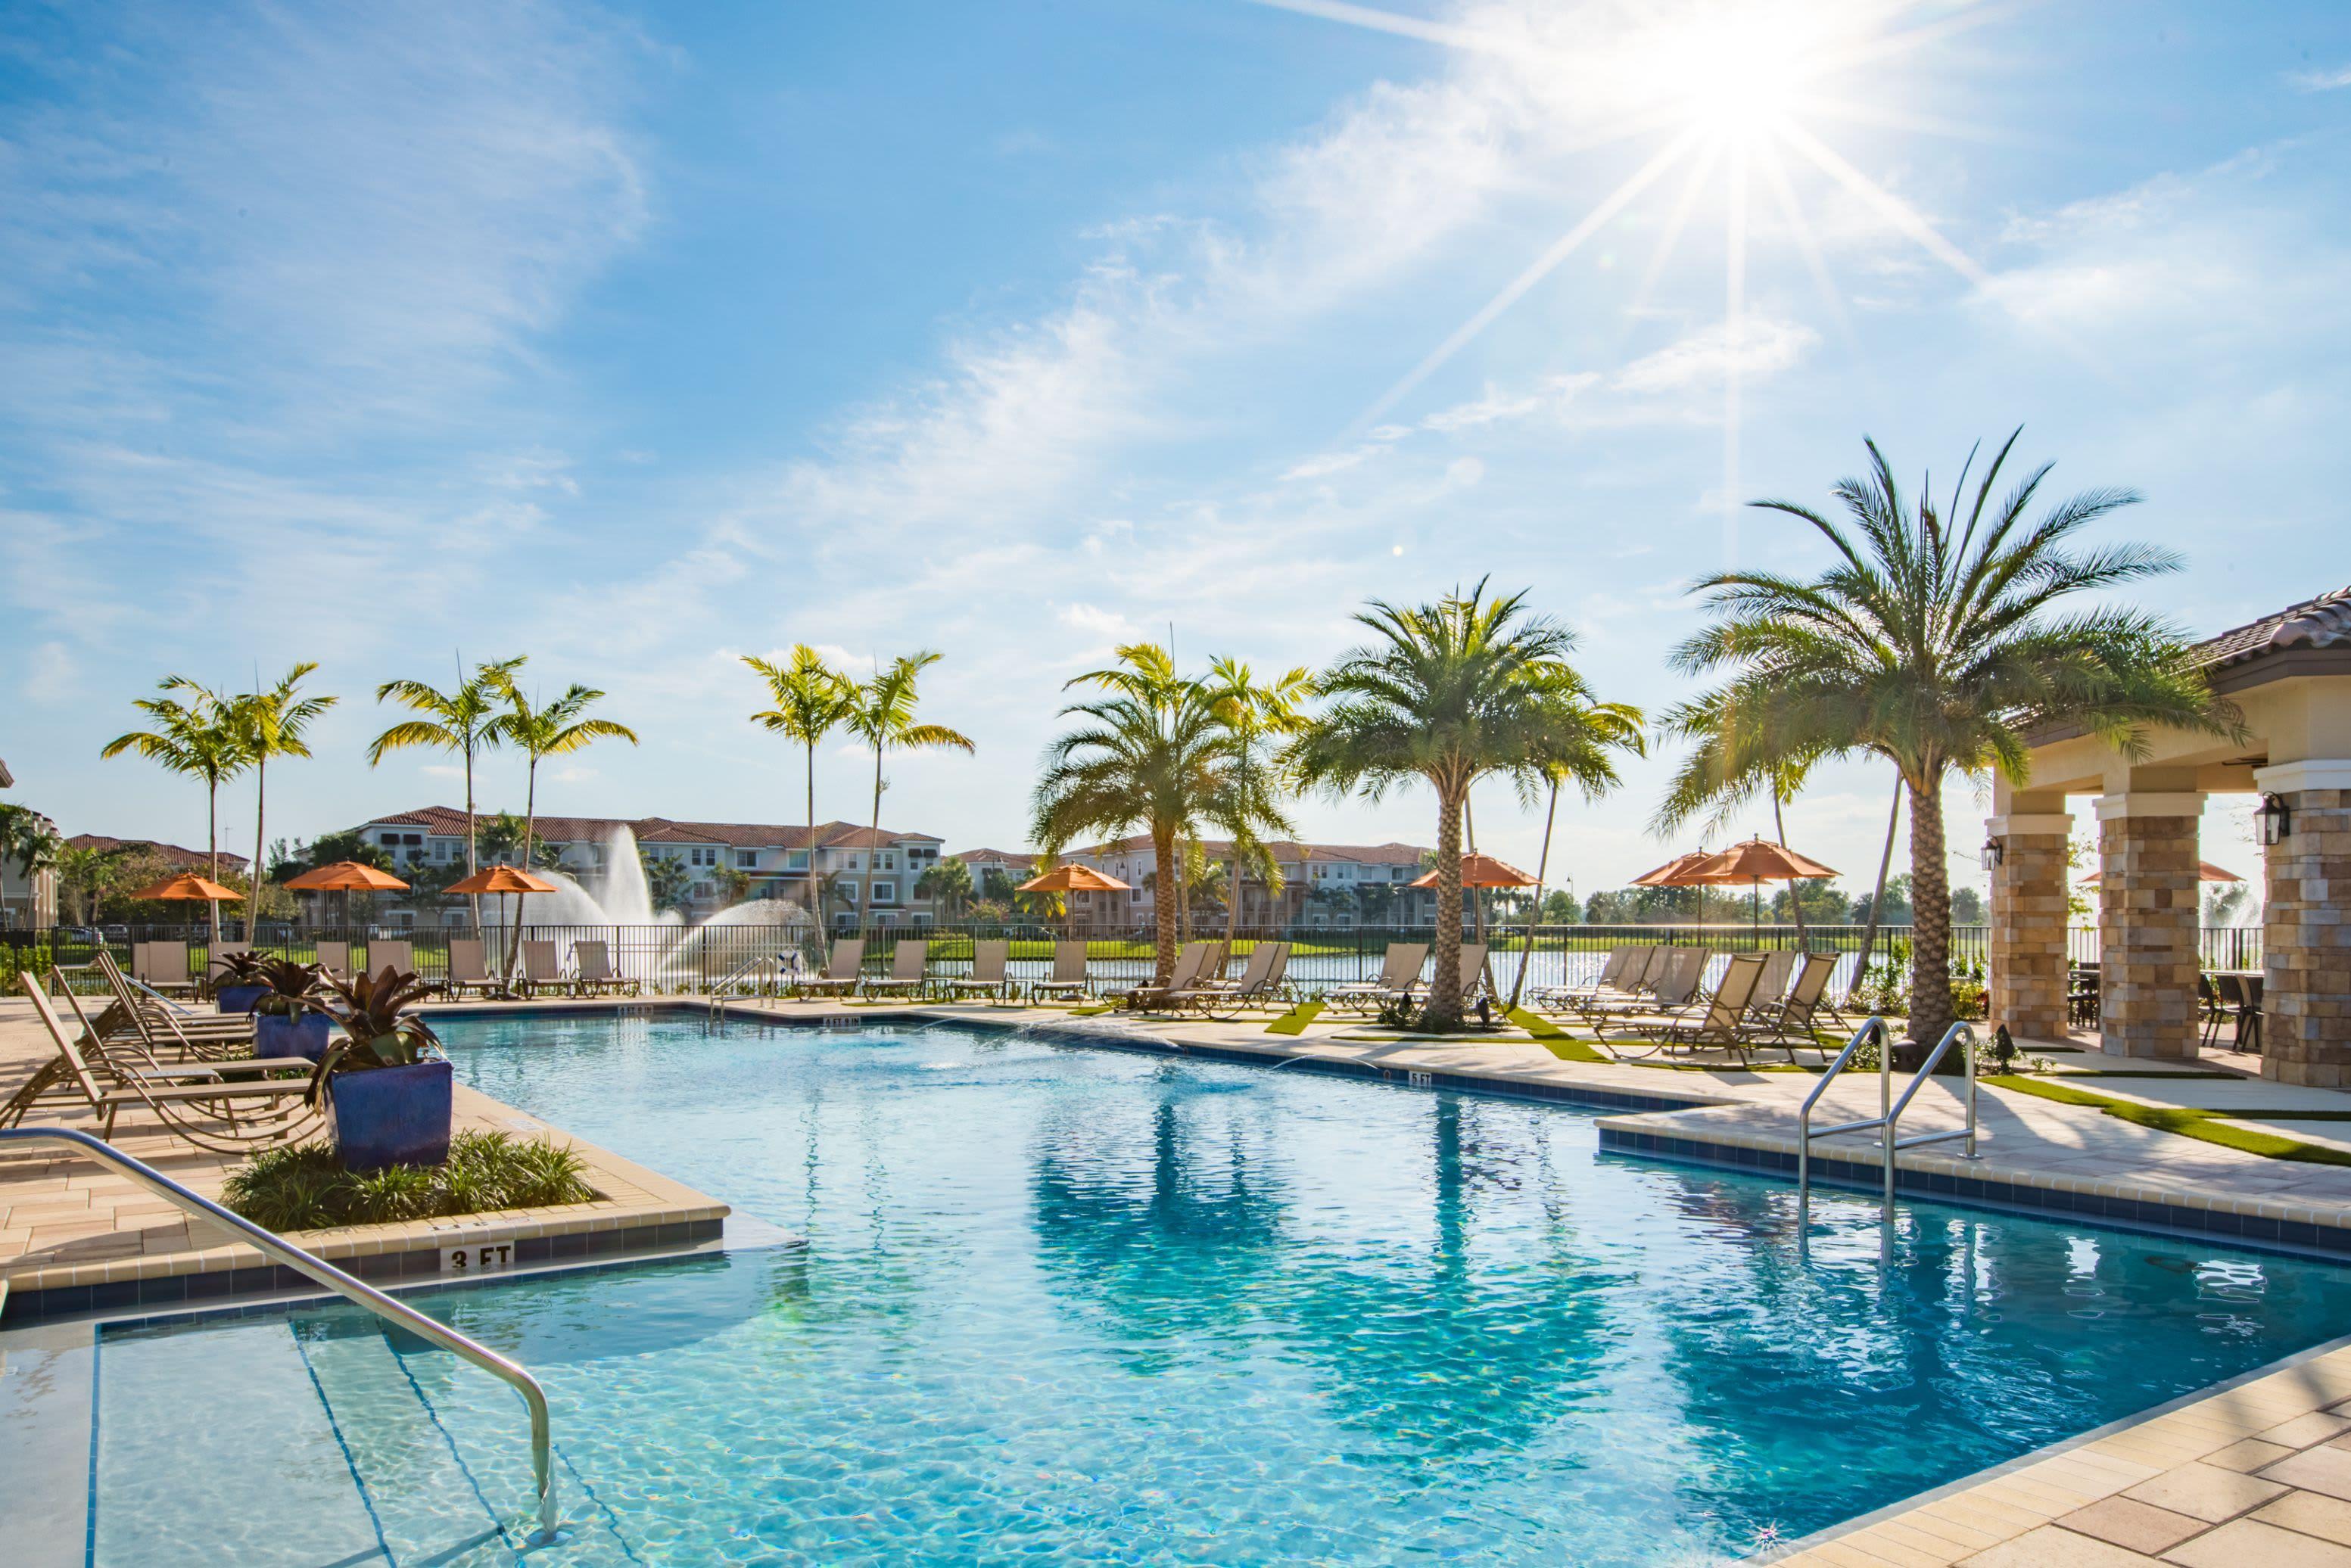 Stunning Swimming Pool at Luma Miramar Apartments in Miramar, Florida.